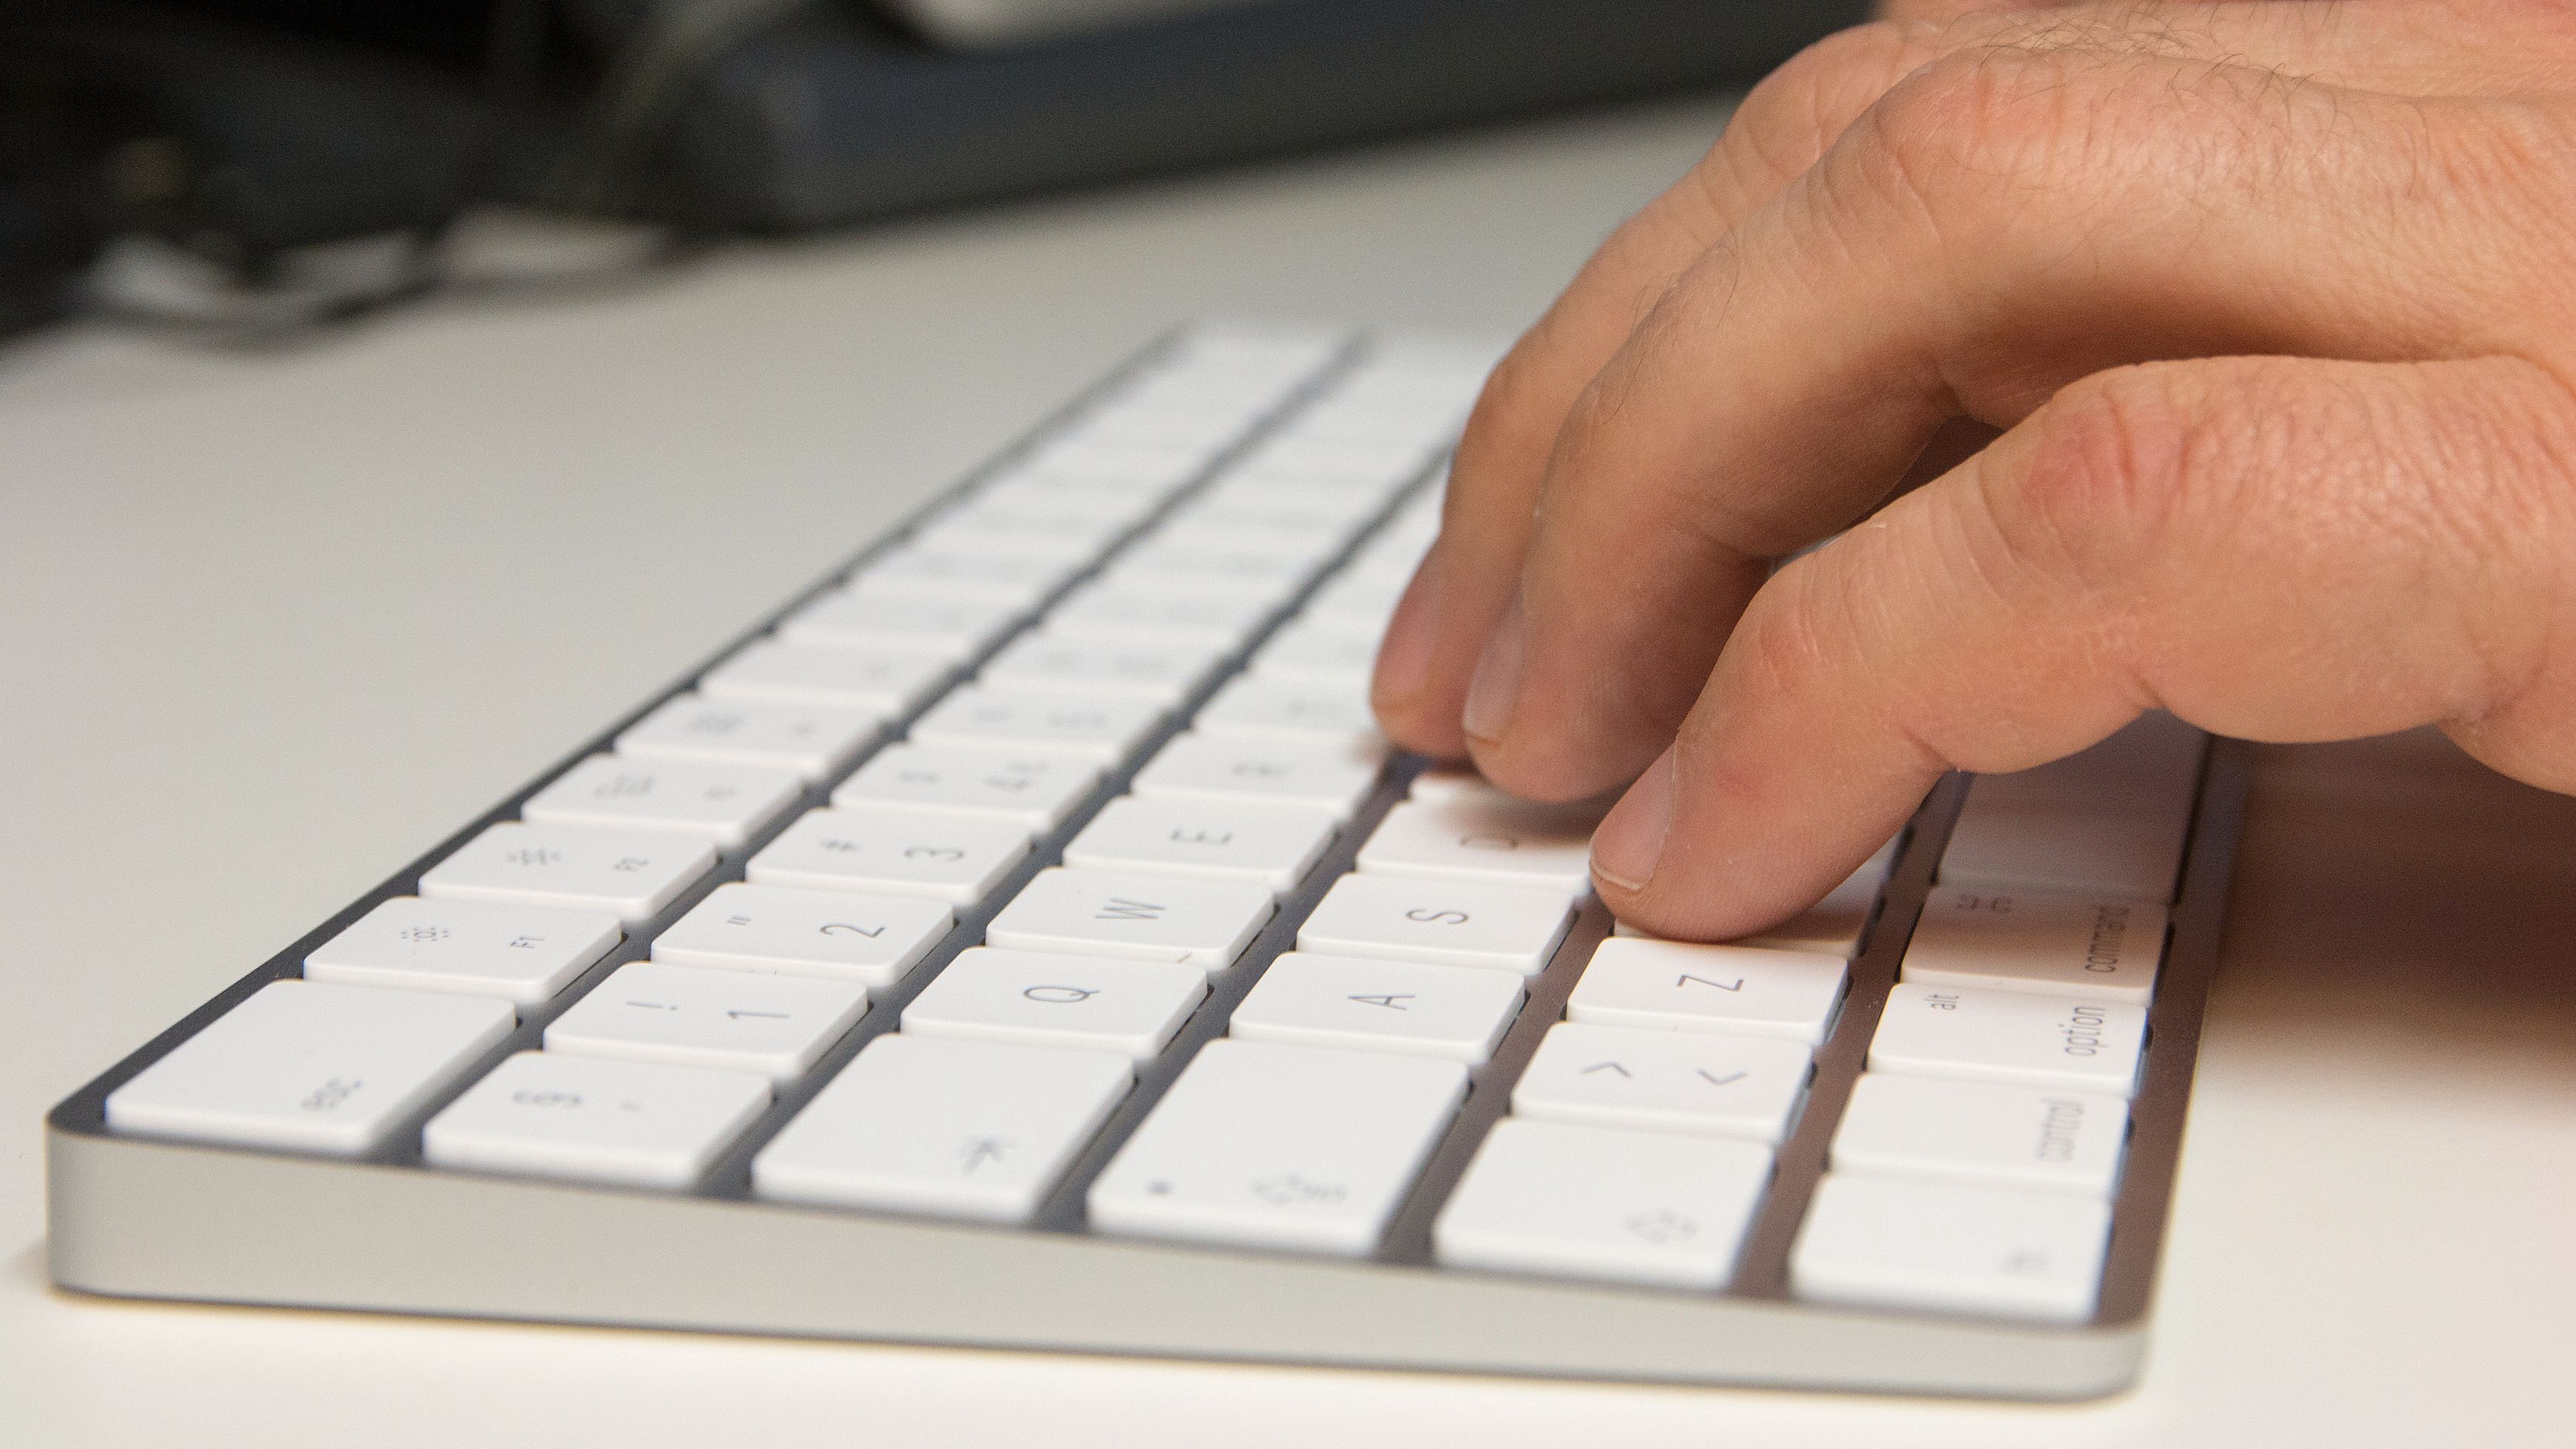 Apple Magic Keyboard (2015)